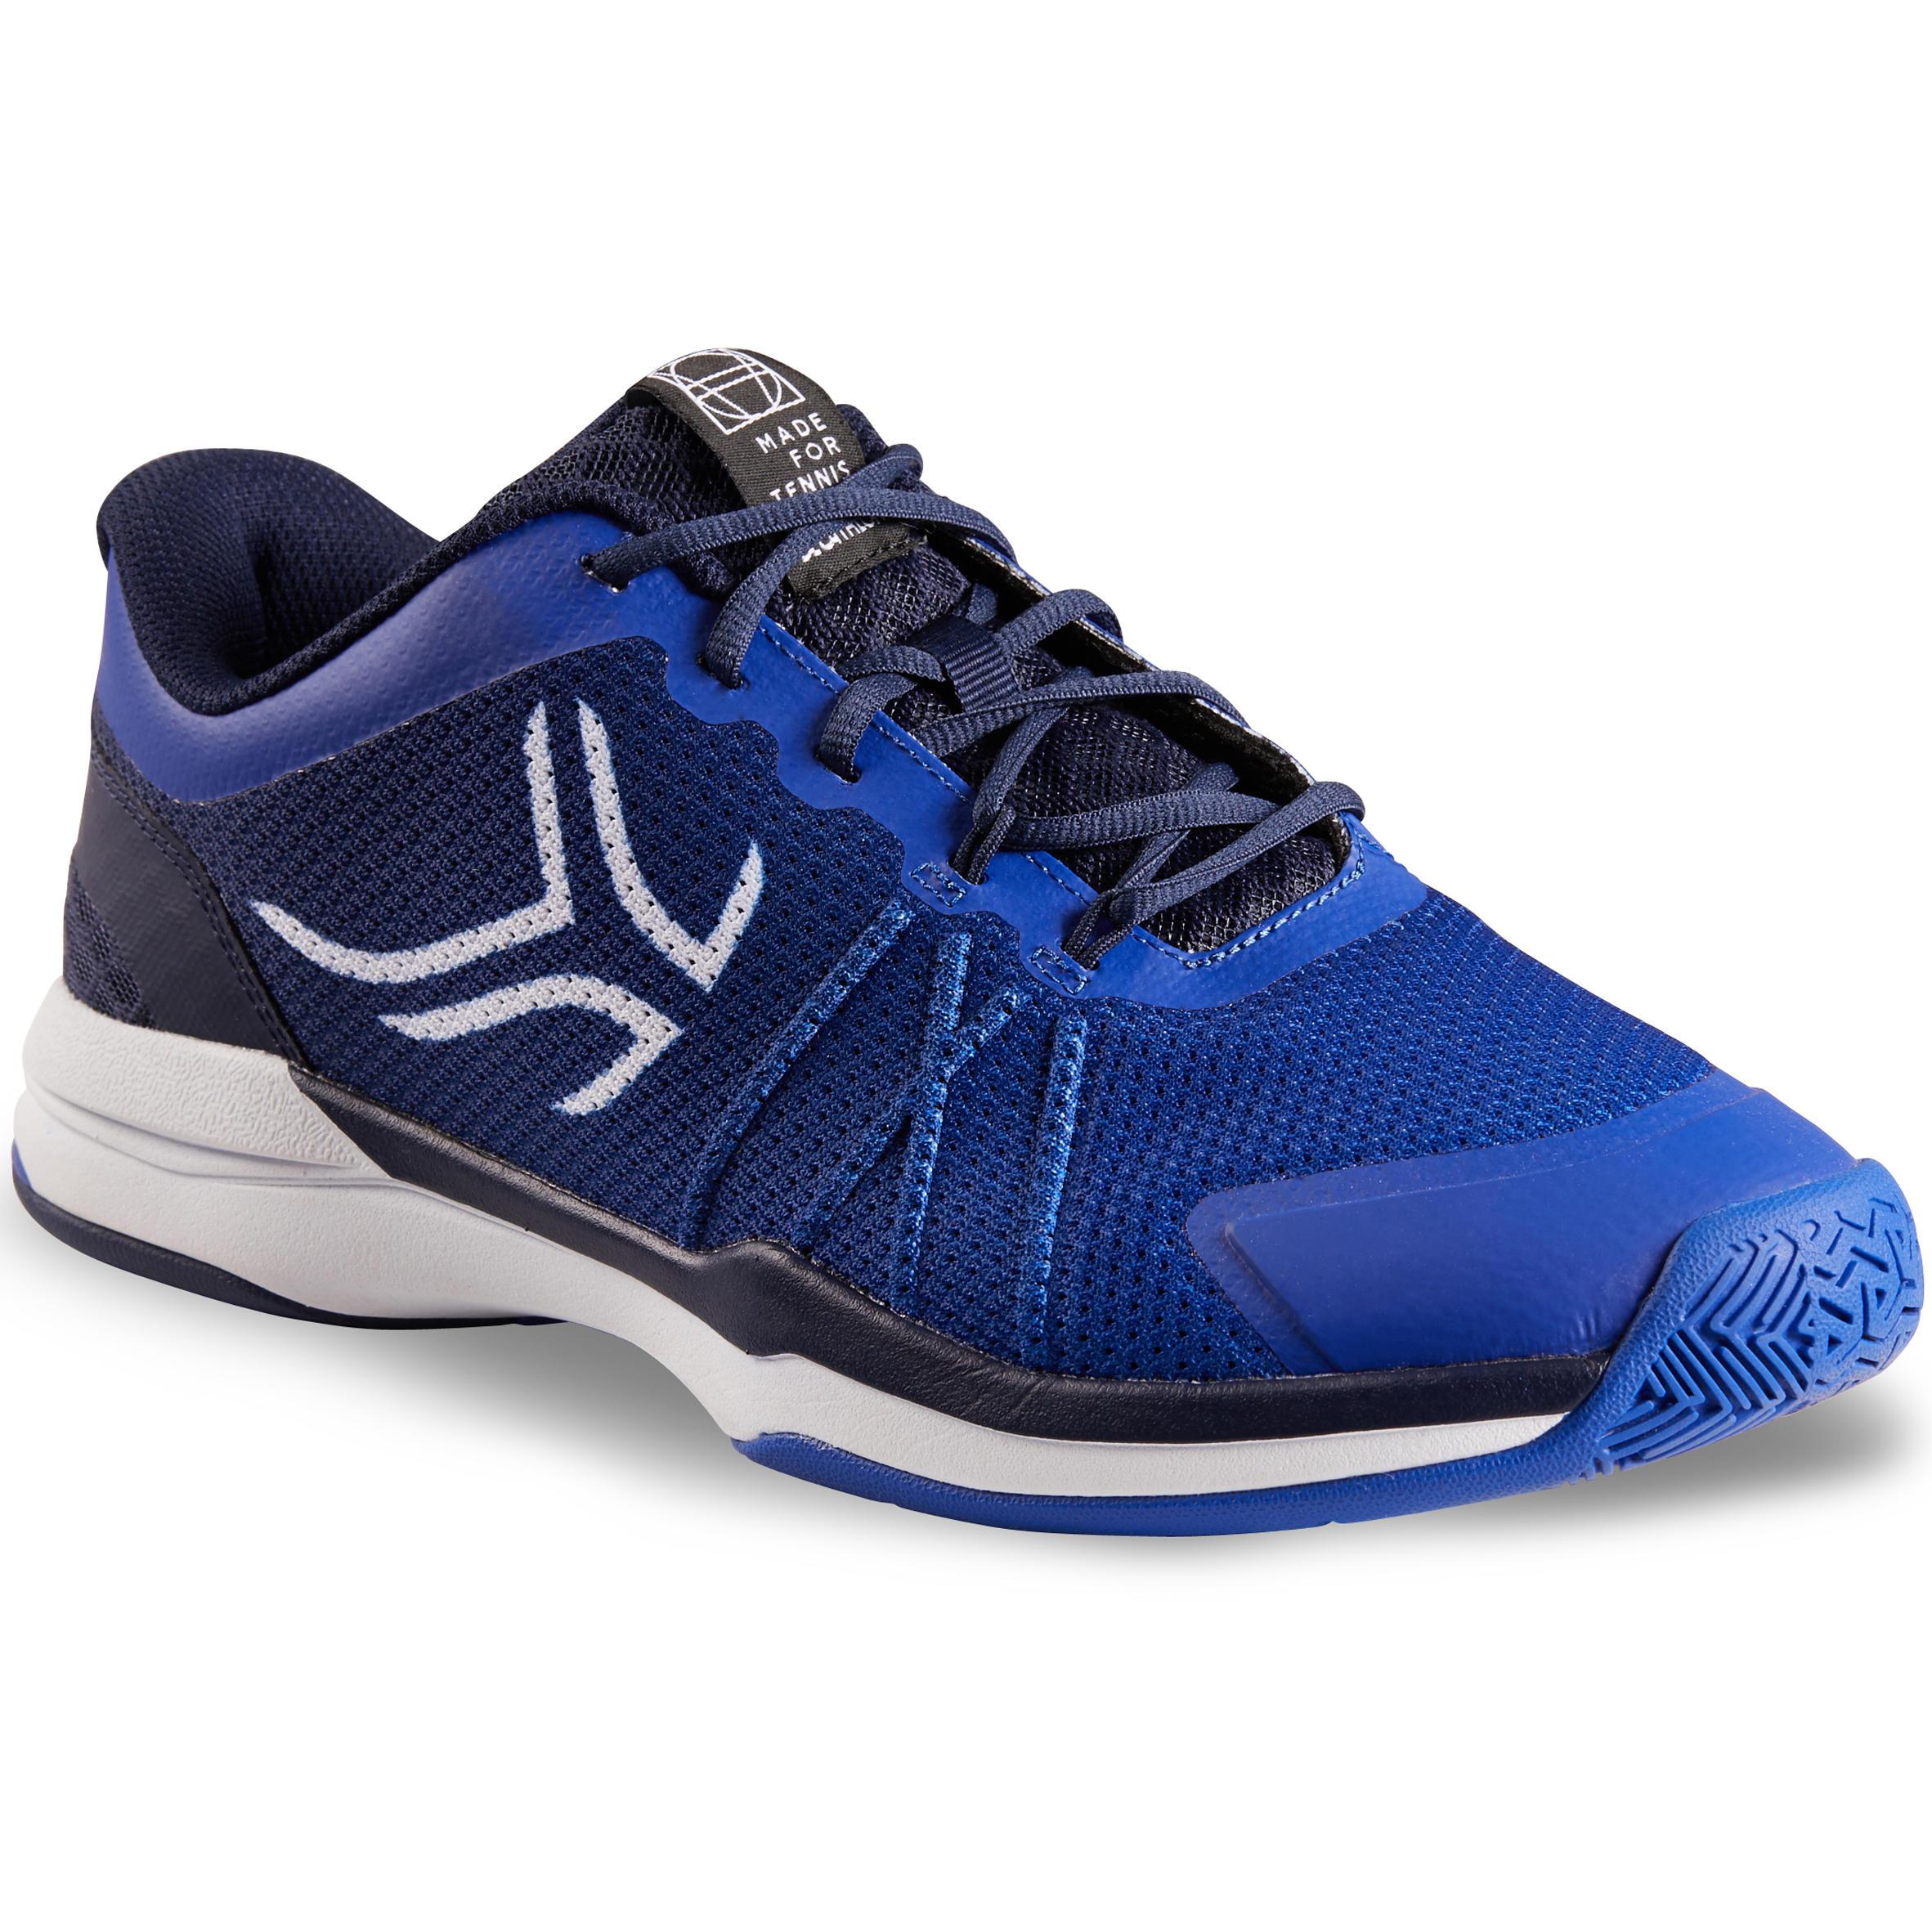 rencontrer 4b7be cca47 Chaussures tennis | Decathlon